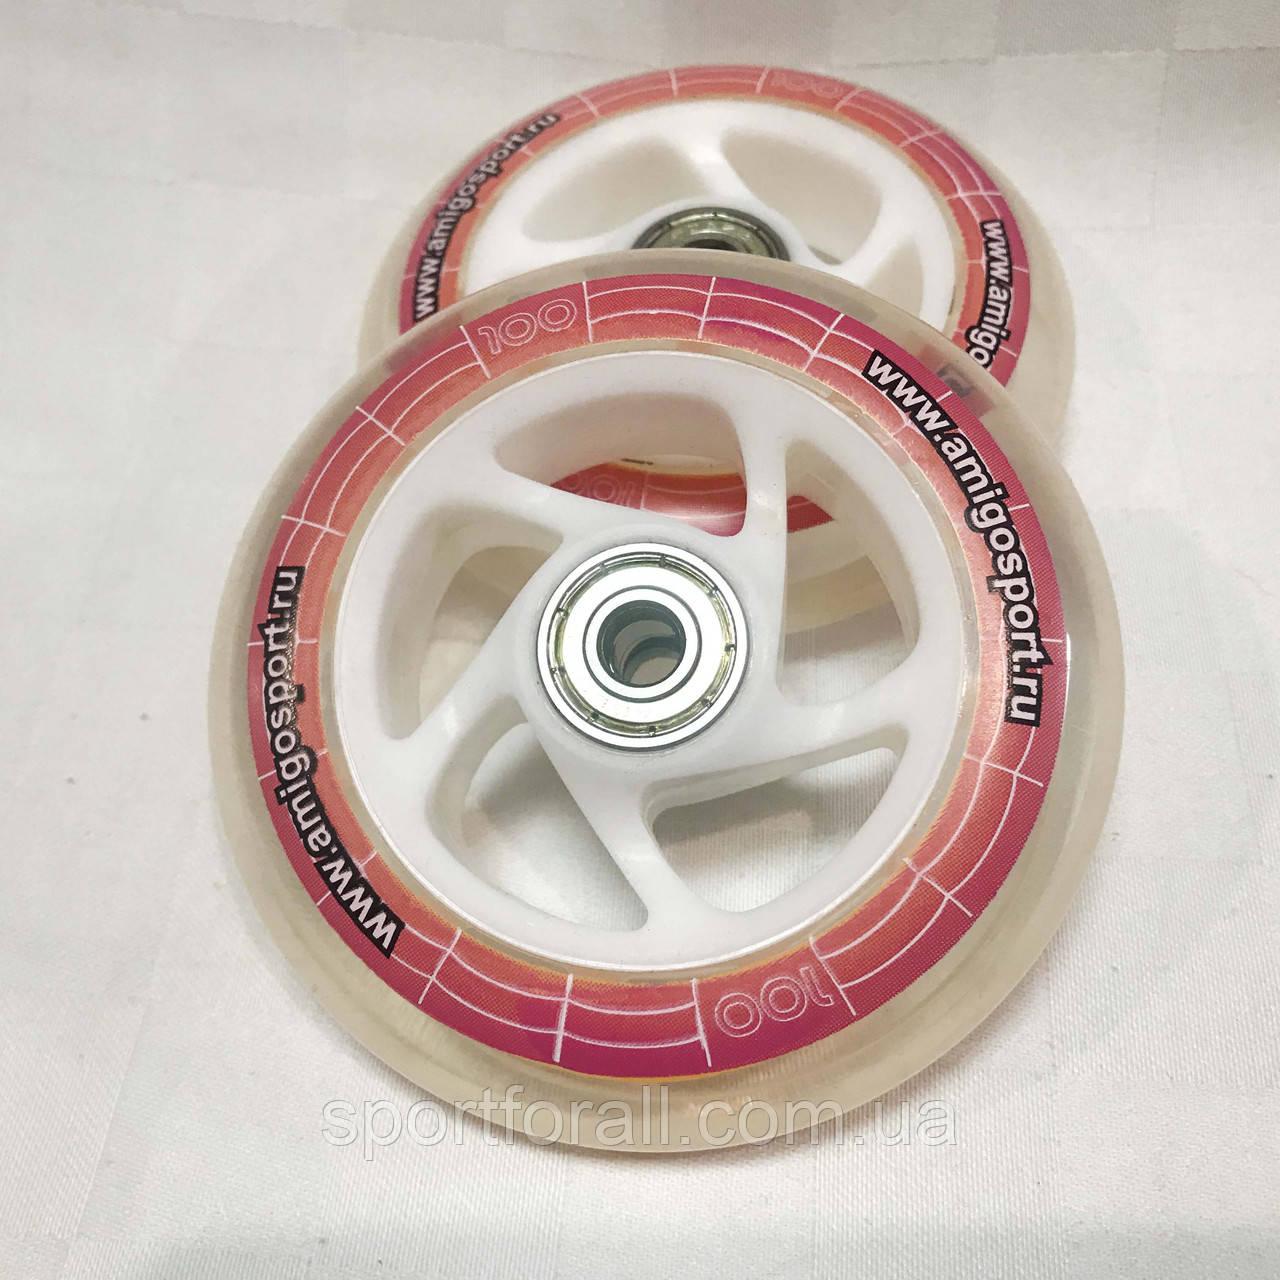 Колеса для самоката с подшипником 608-ZZ Explore Scooter Wheels 100мм (2шт)